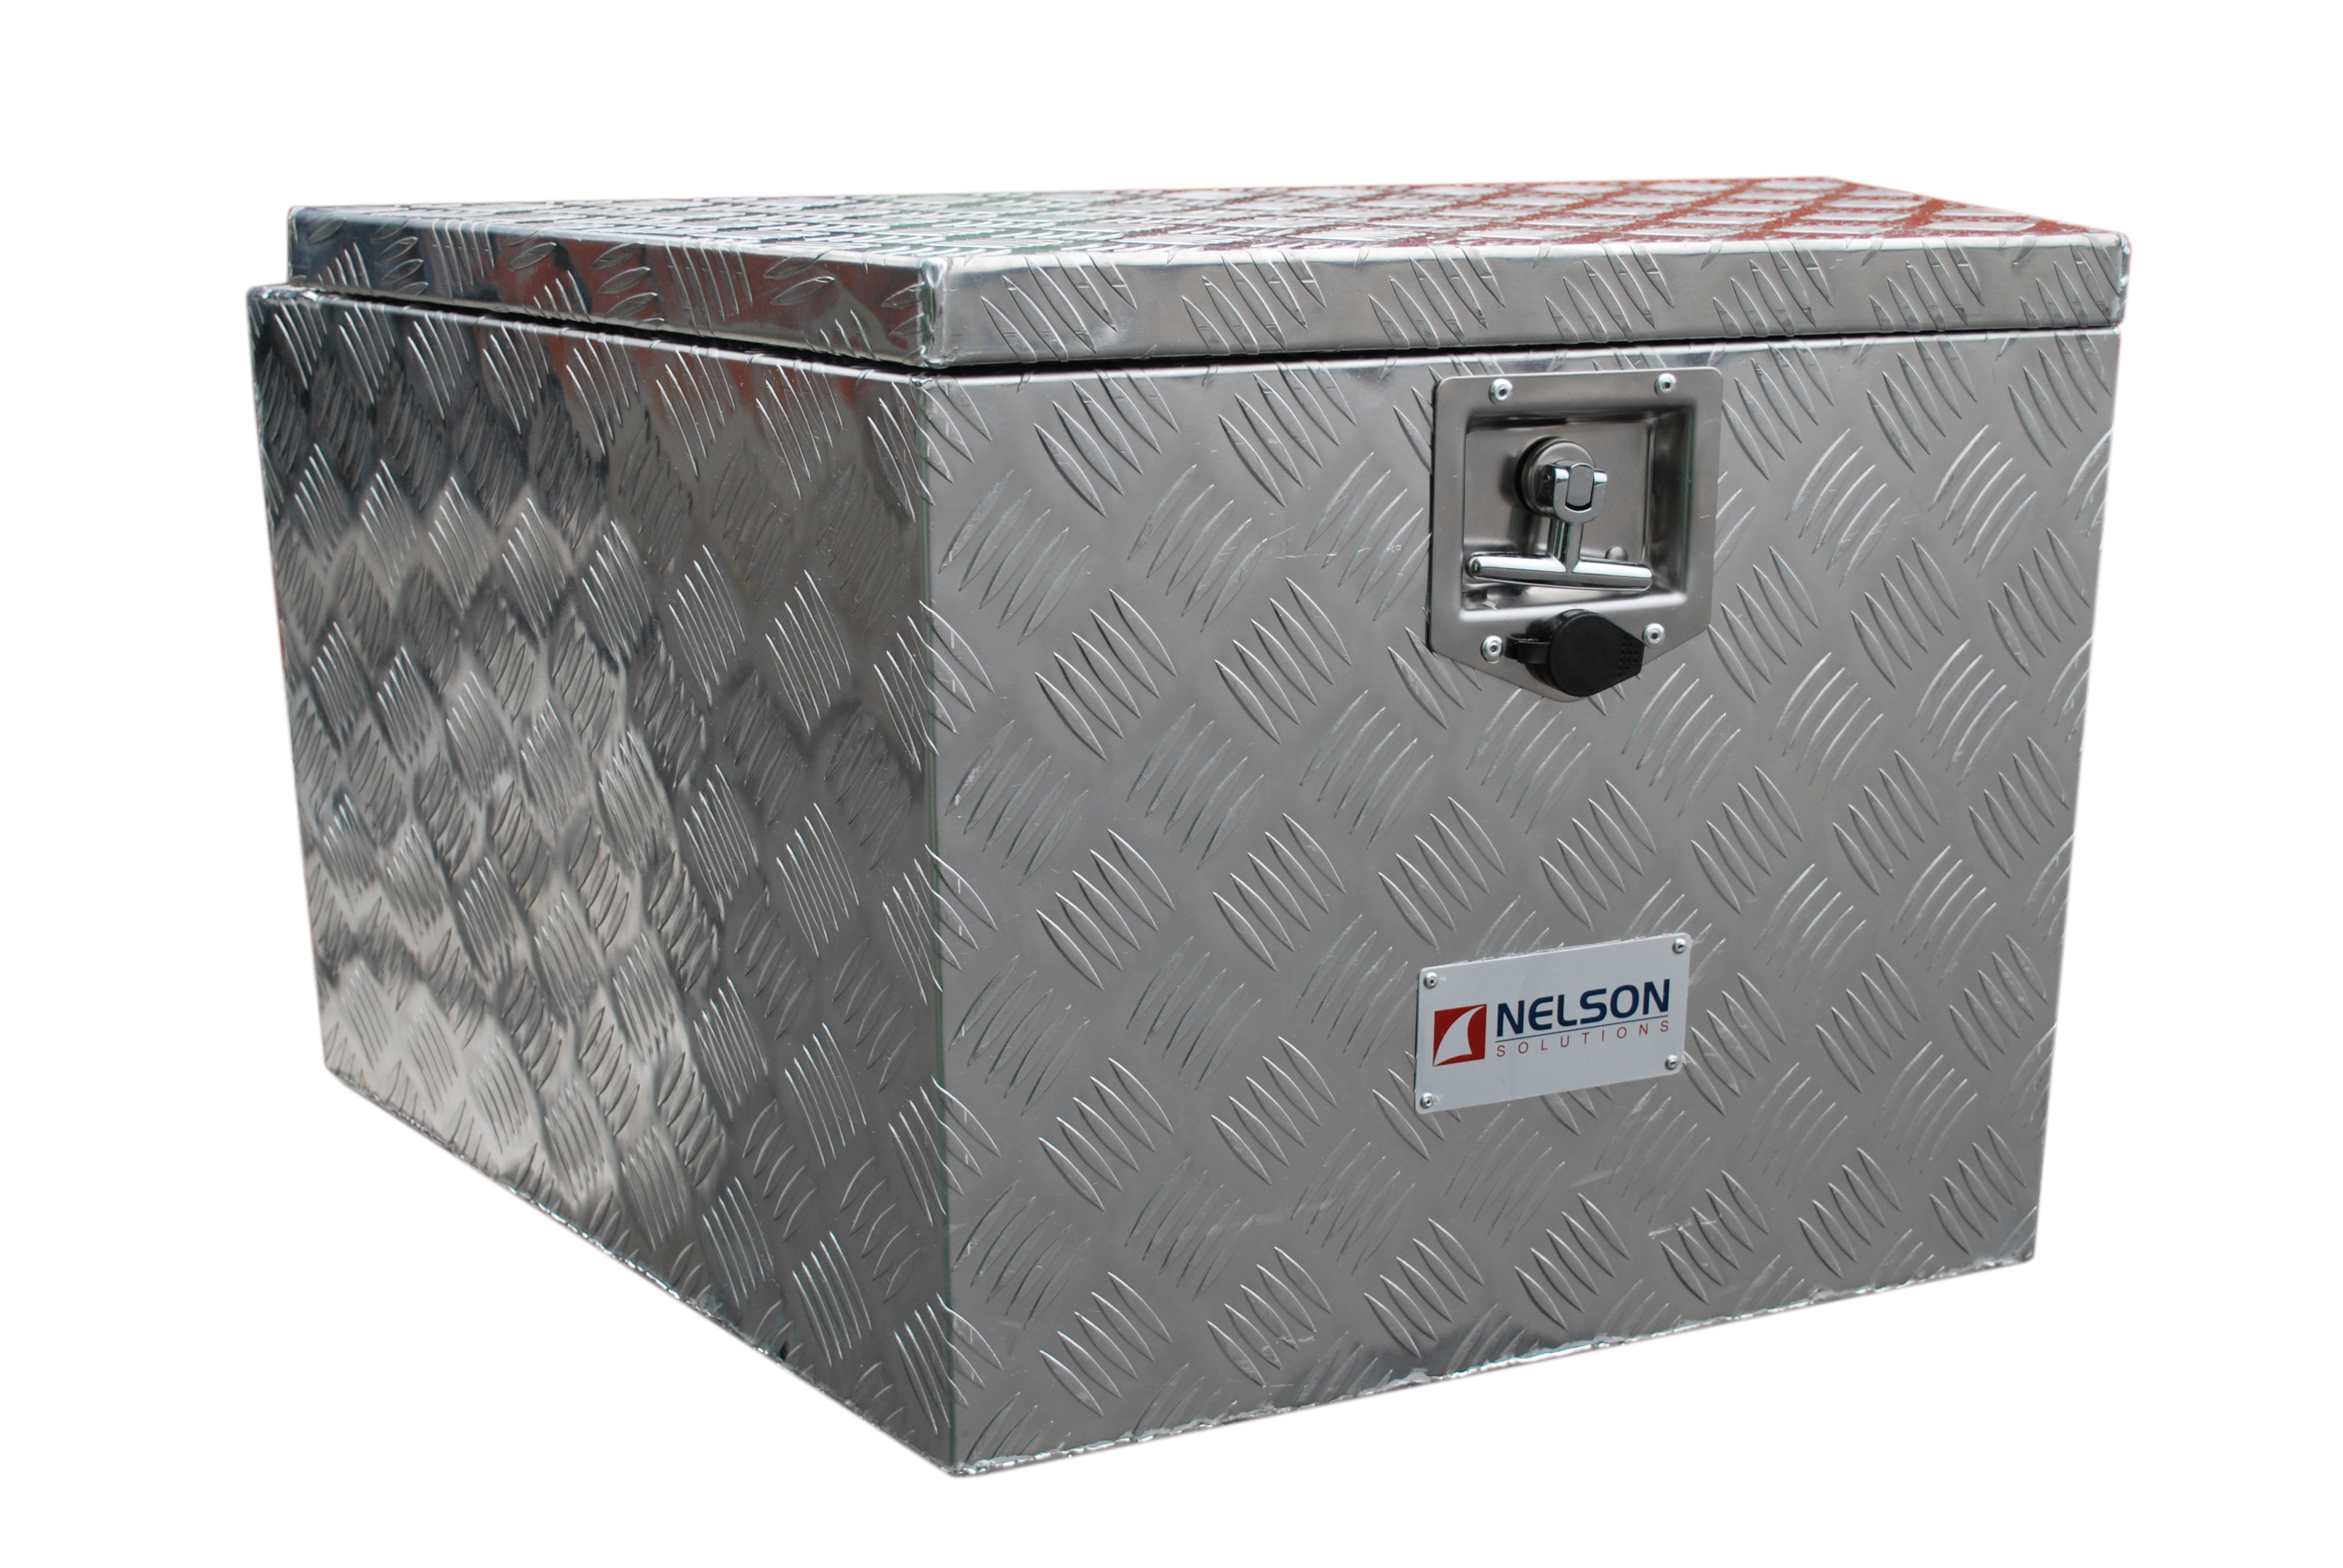 Alboxtrap